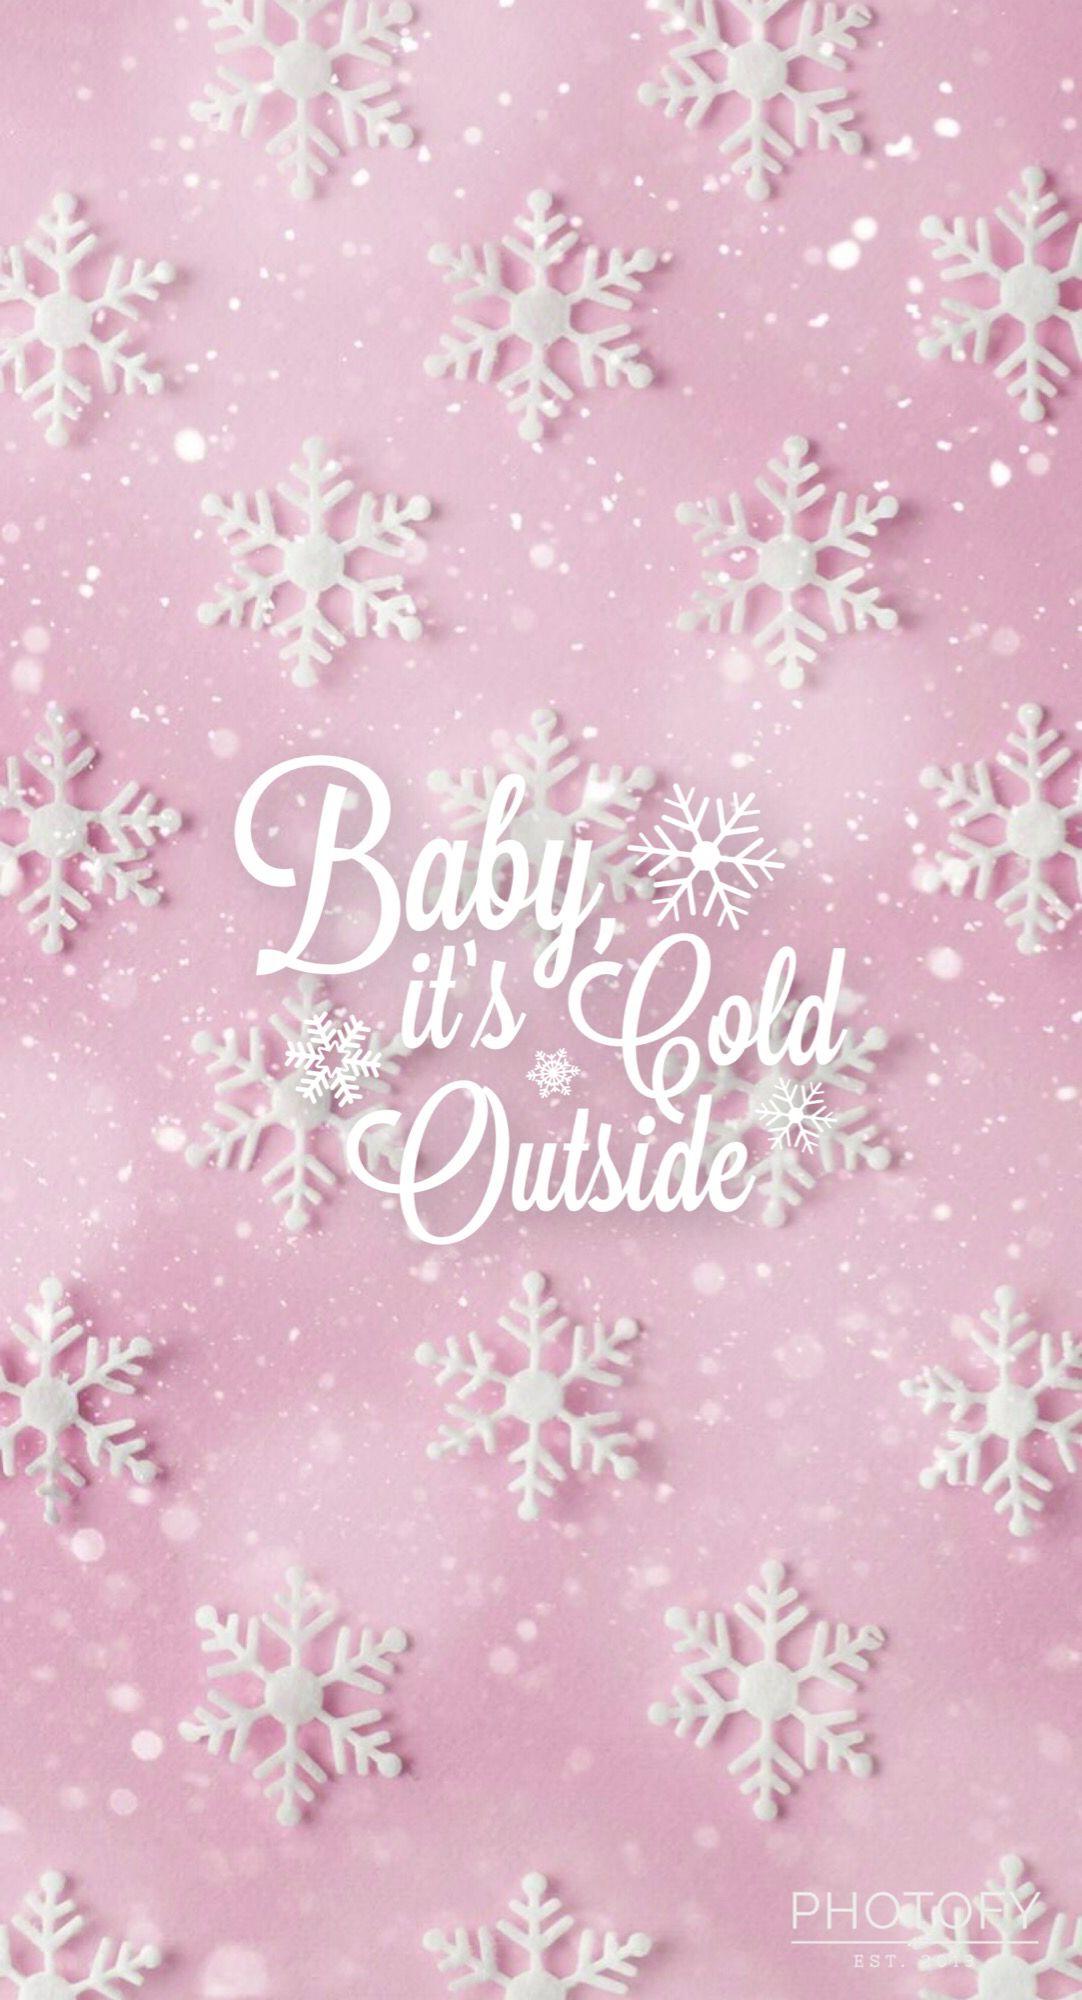 Pink Snowflakes Winter Christmas Phone Wallpaper Wallpaper Iphone Christmas Christmas Wallpaper